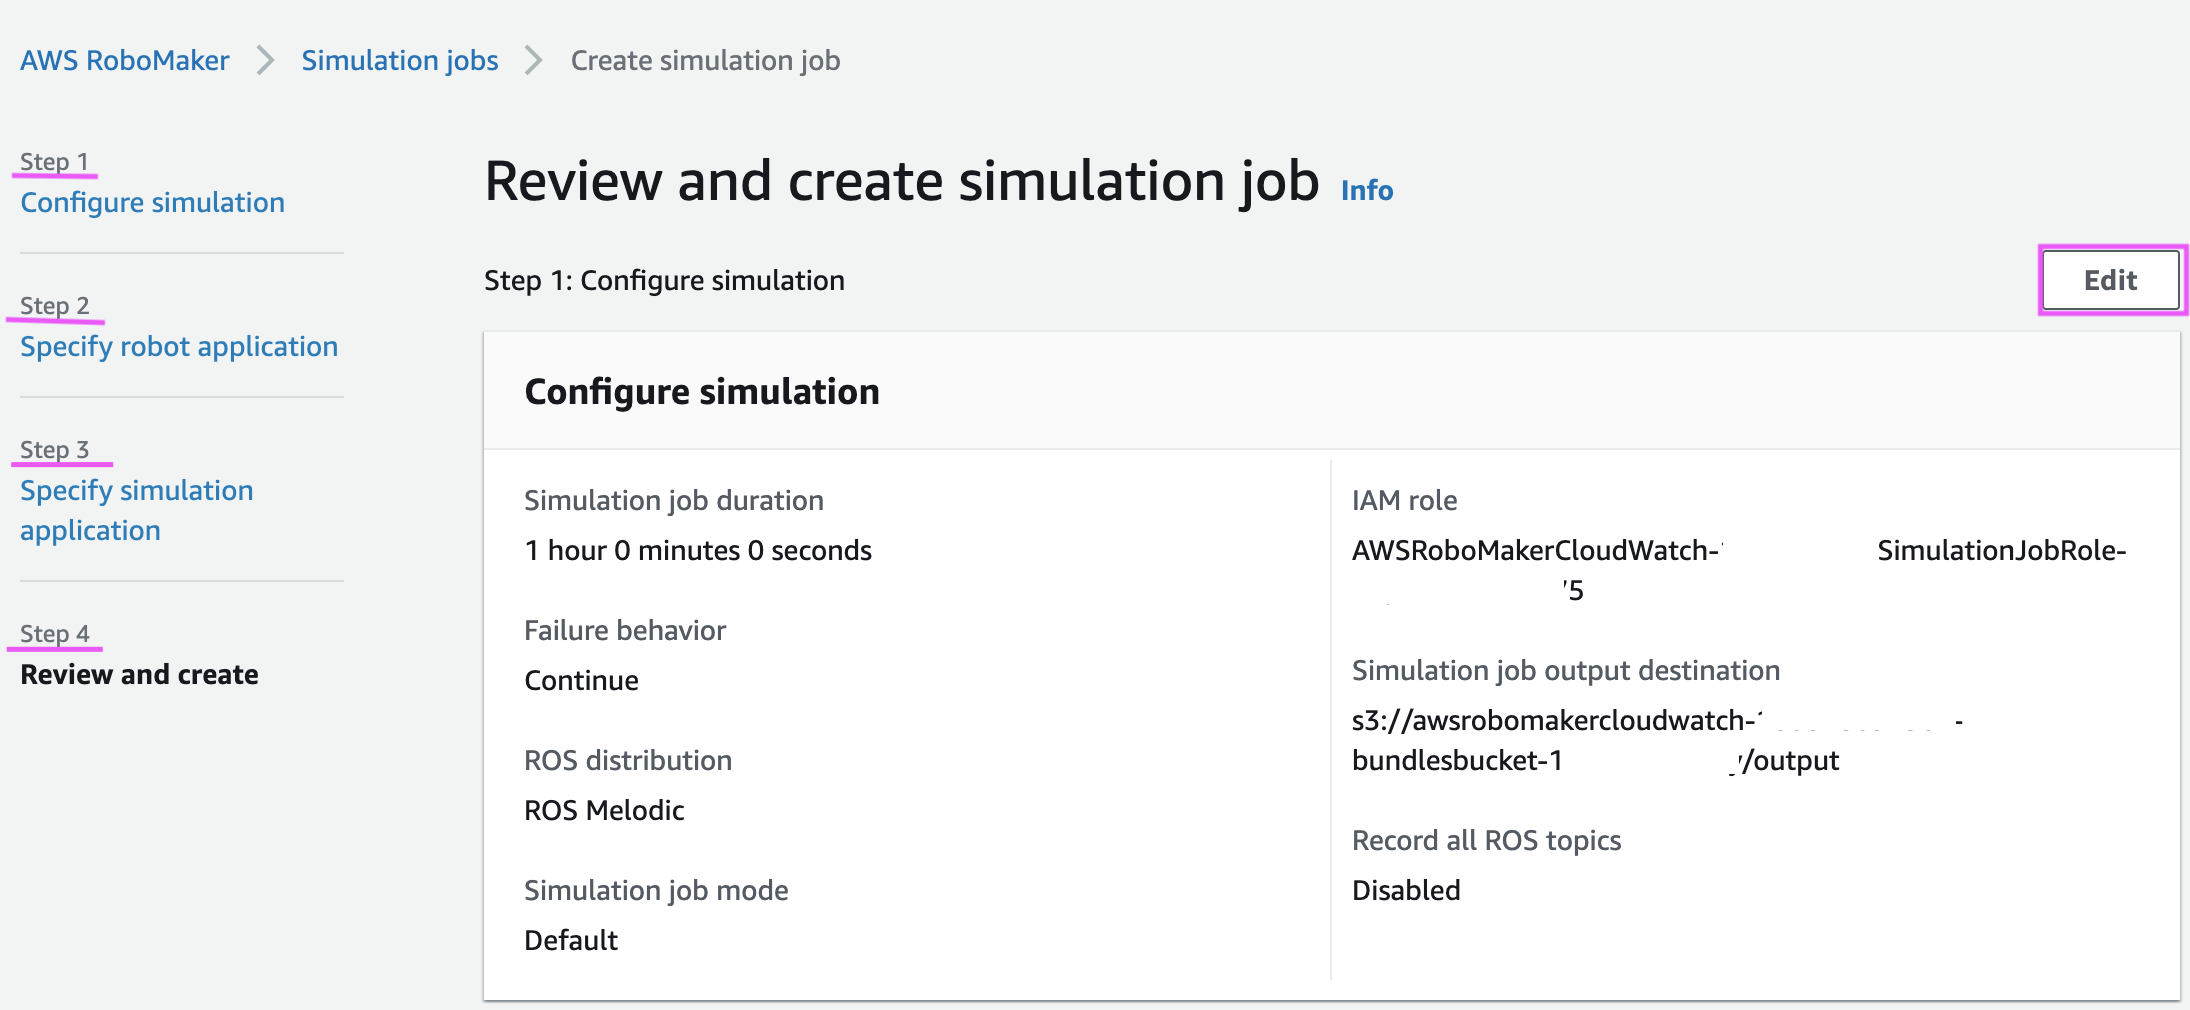 Configure a simulation job in AWS RoboMaker